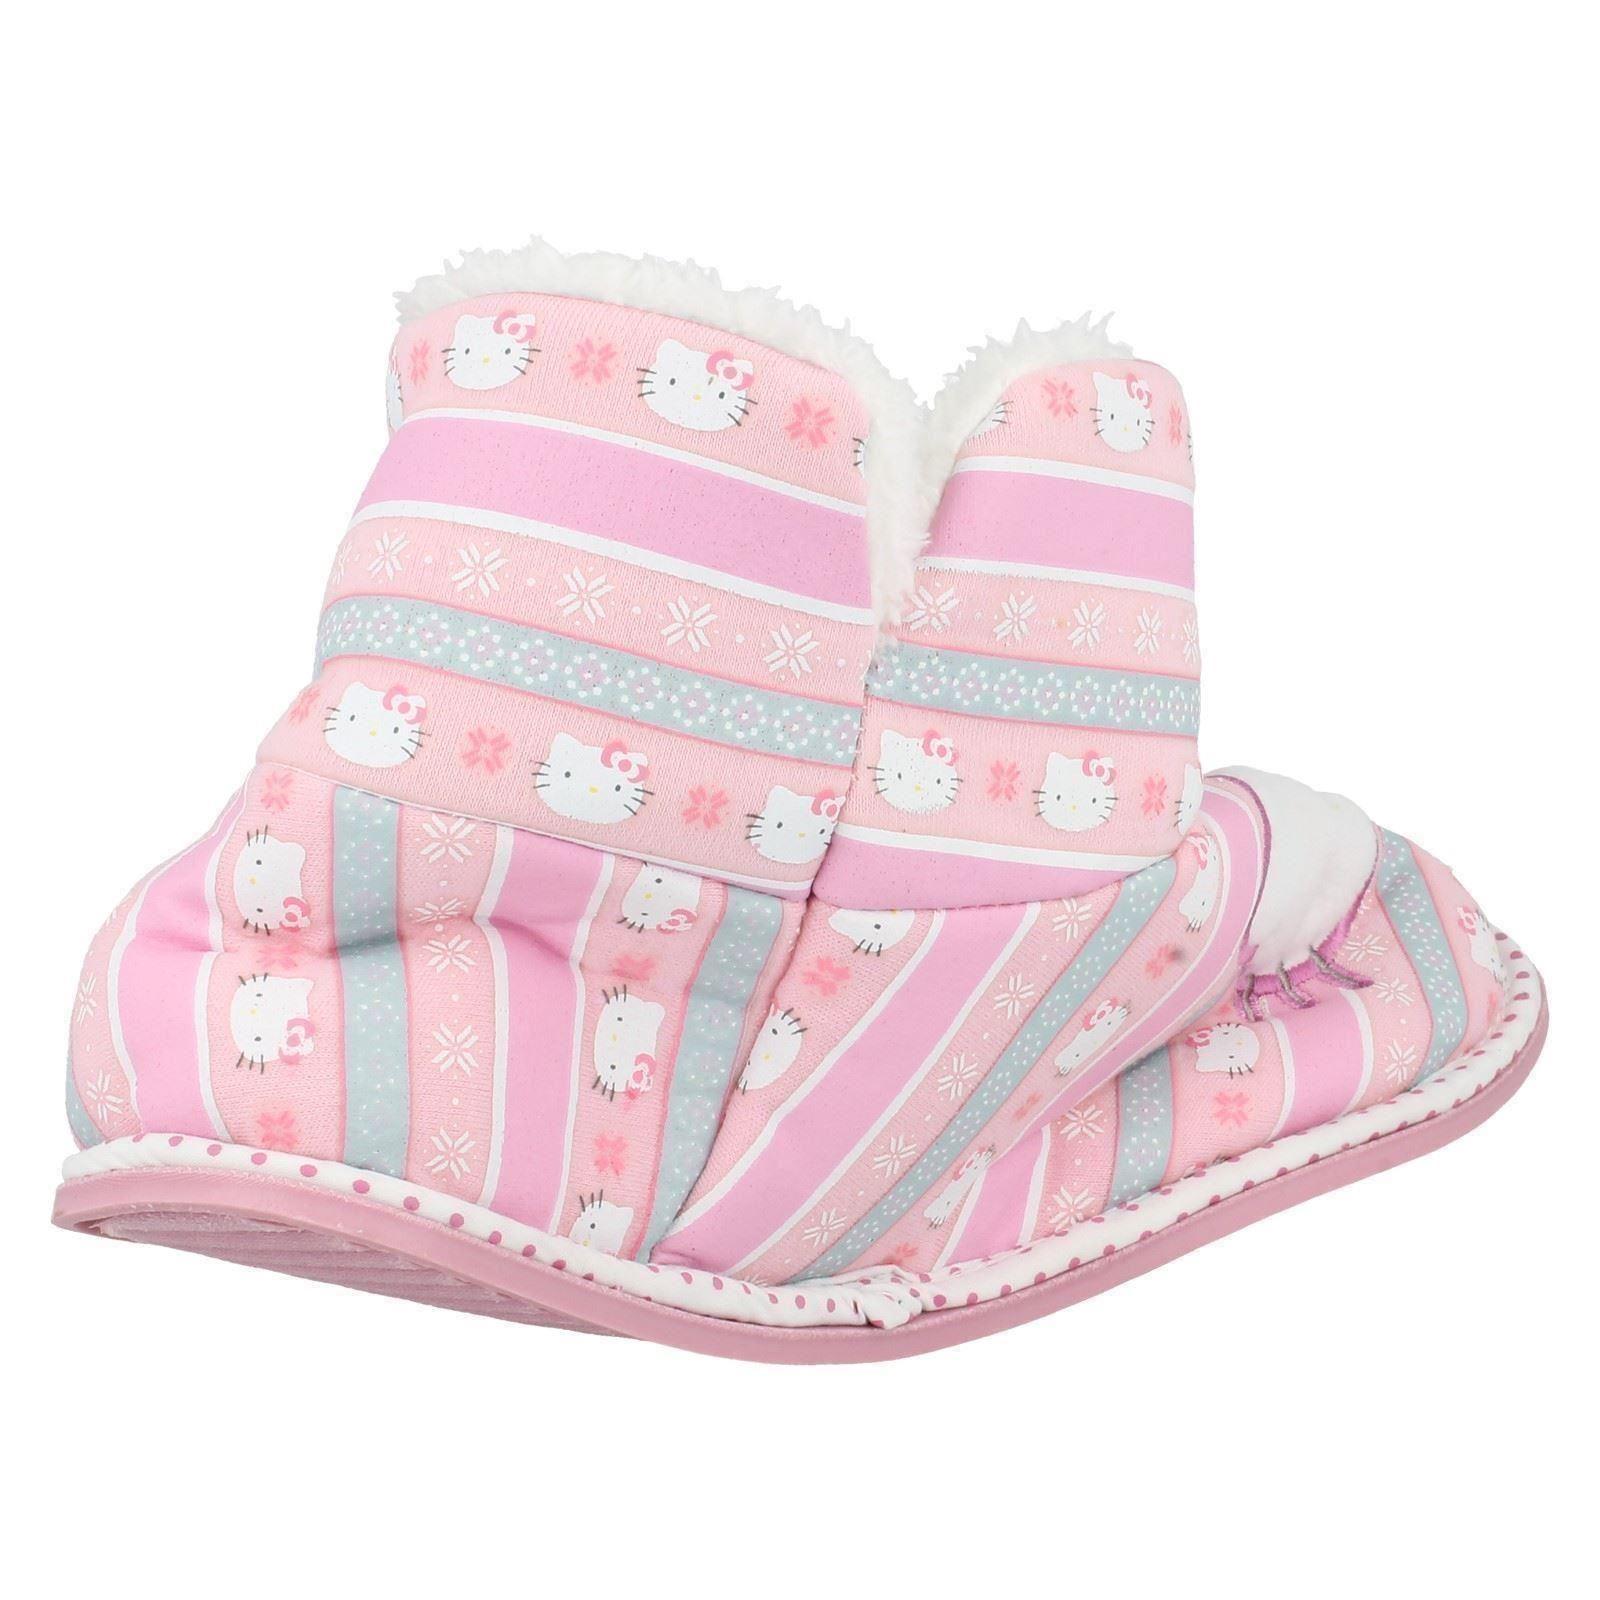 Girls Hello Kitty Slipper Boots 320 / 3193